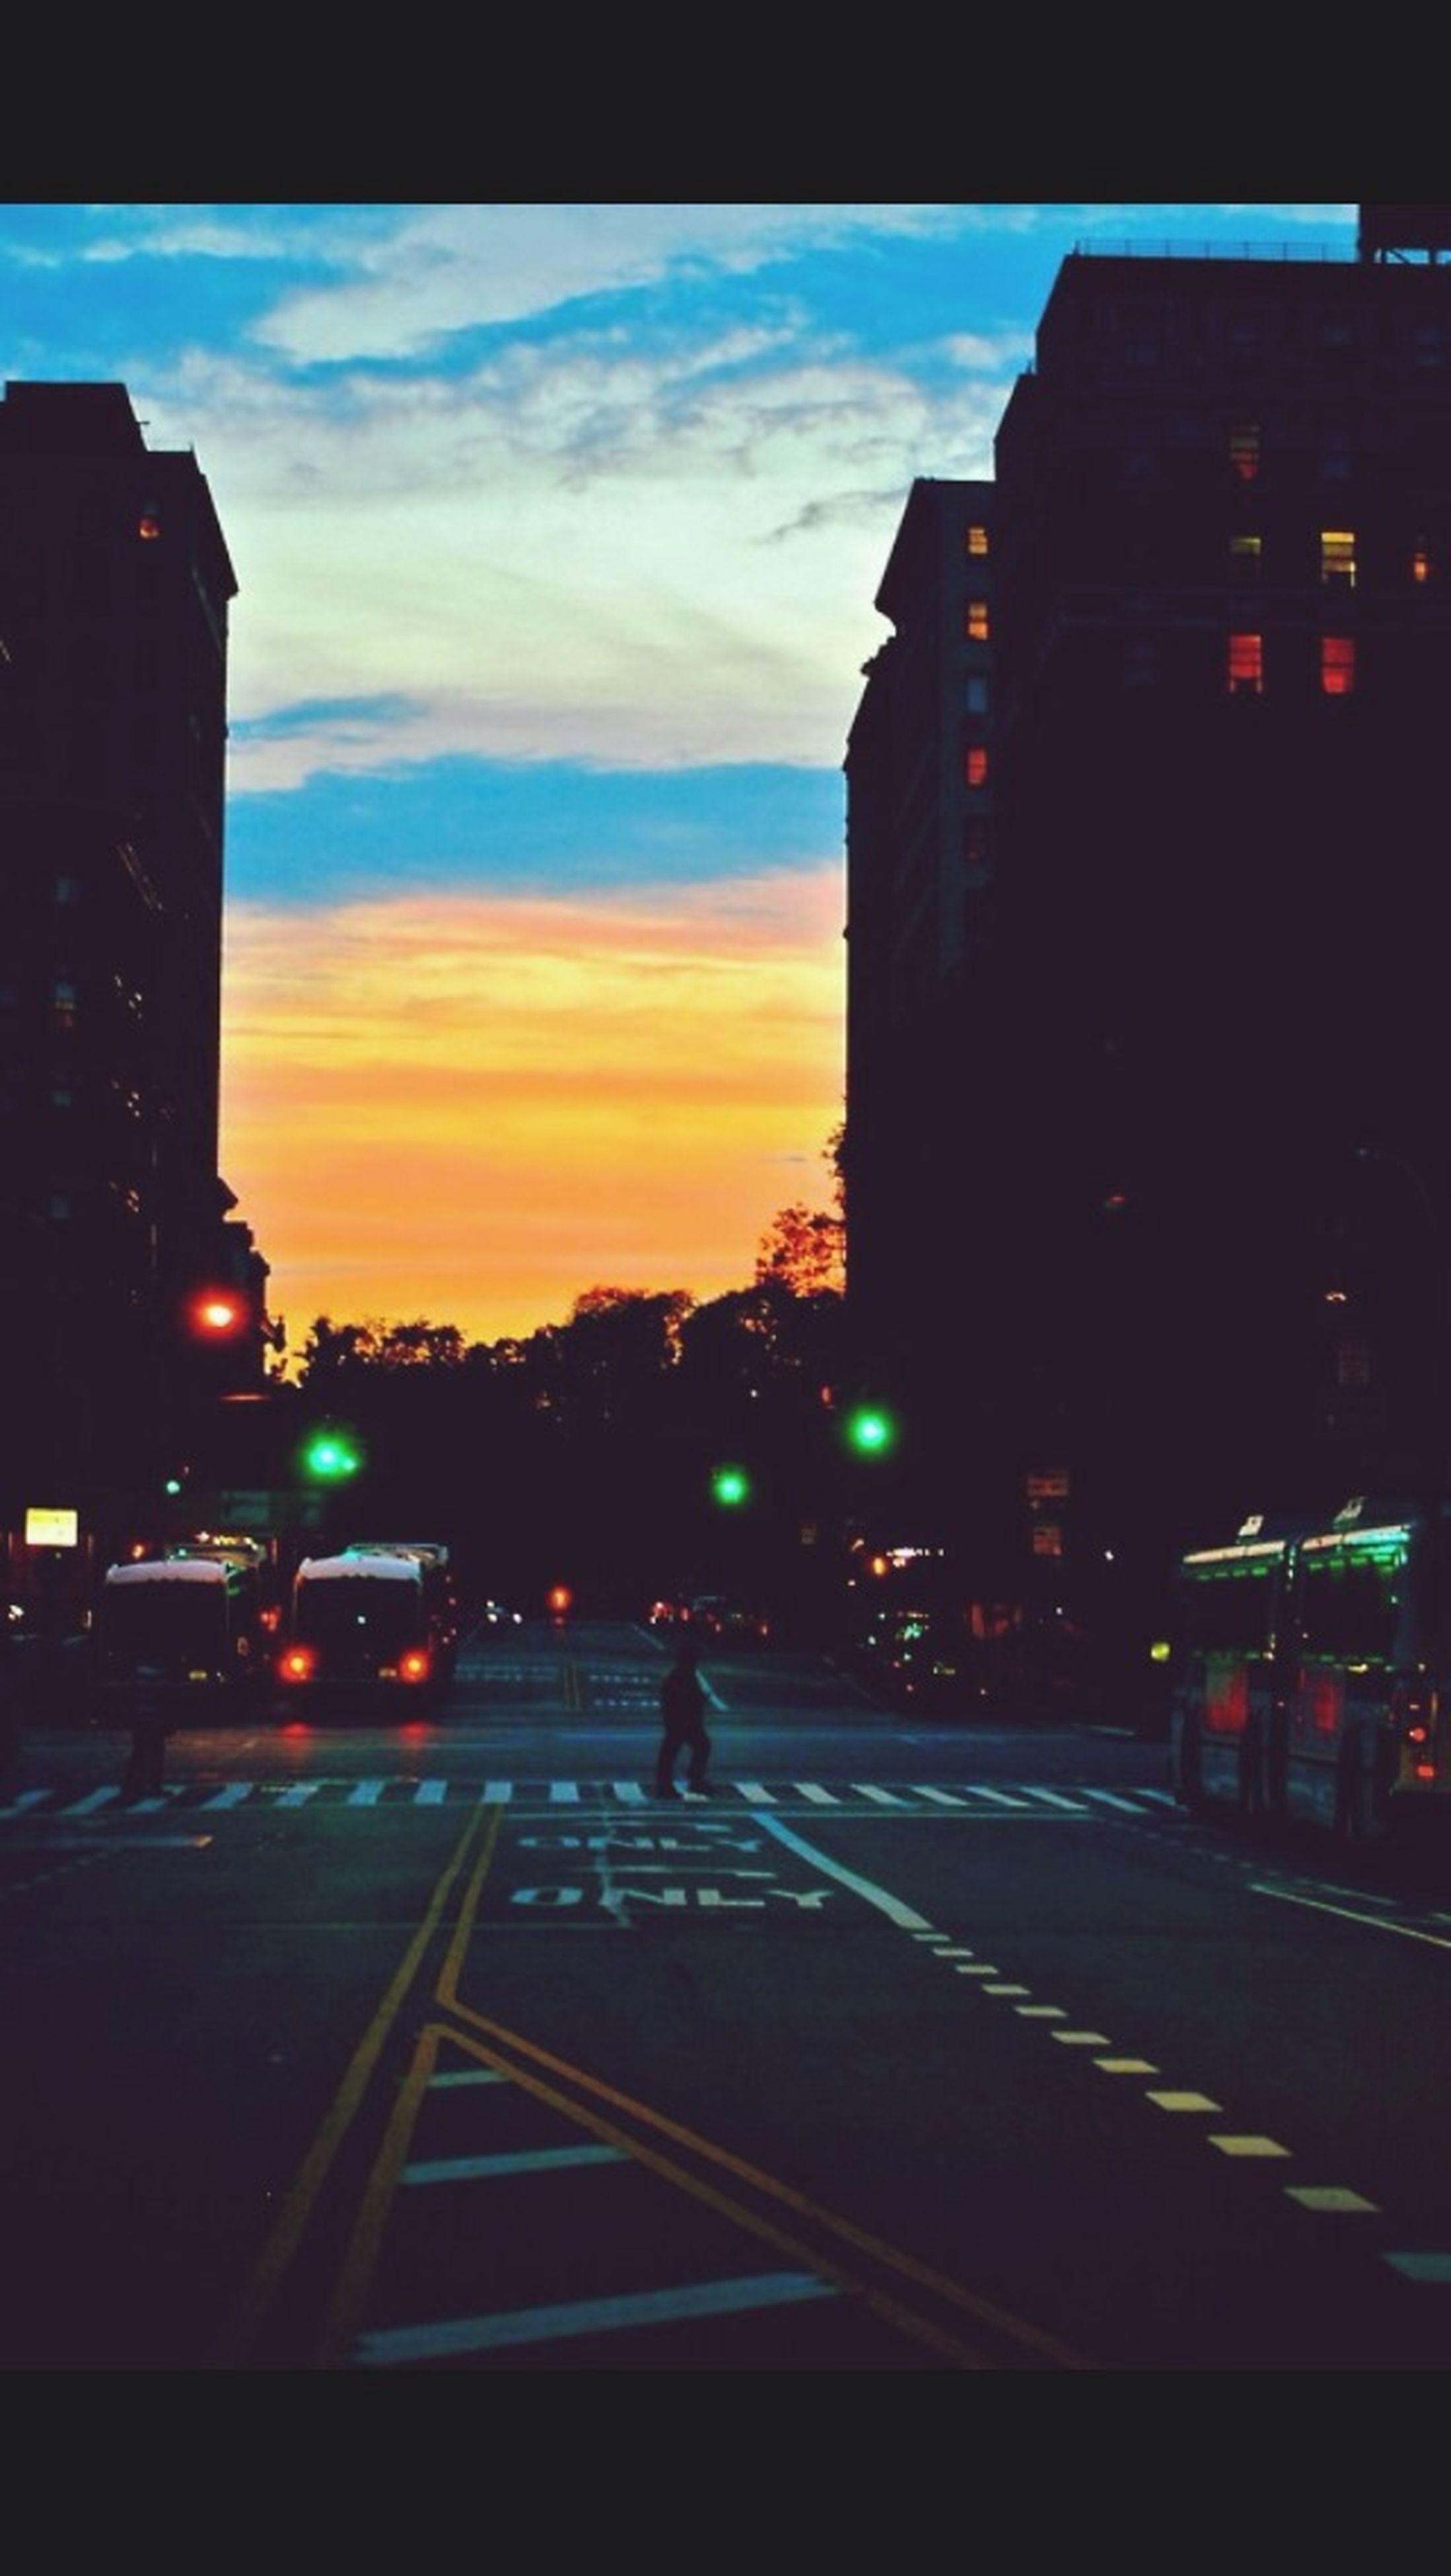 building exterior, architecture, built structure, illuminated, transportation, city, street, sky, road, dusk, sunset, car, night, street light, land vehicle, city street, road marking, city life, silhouette, building